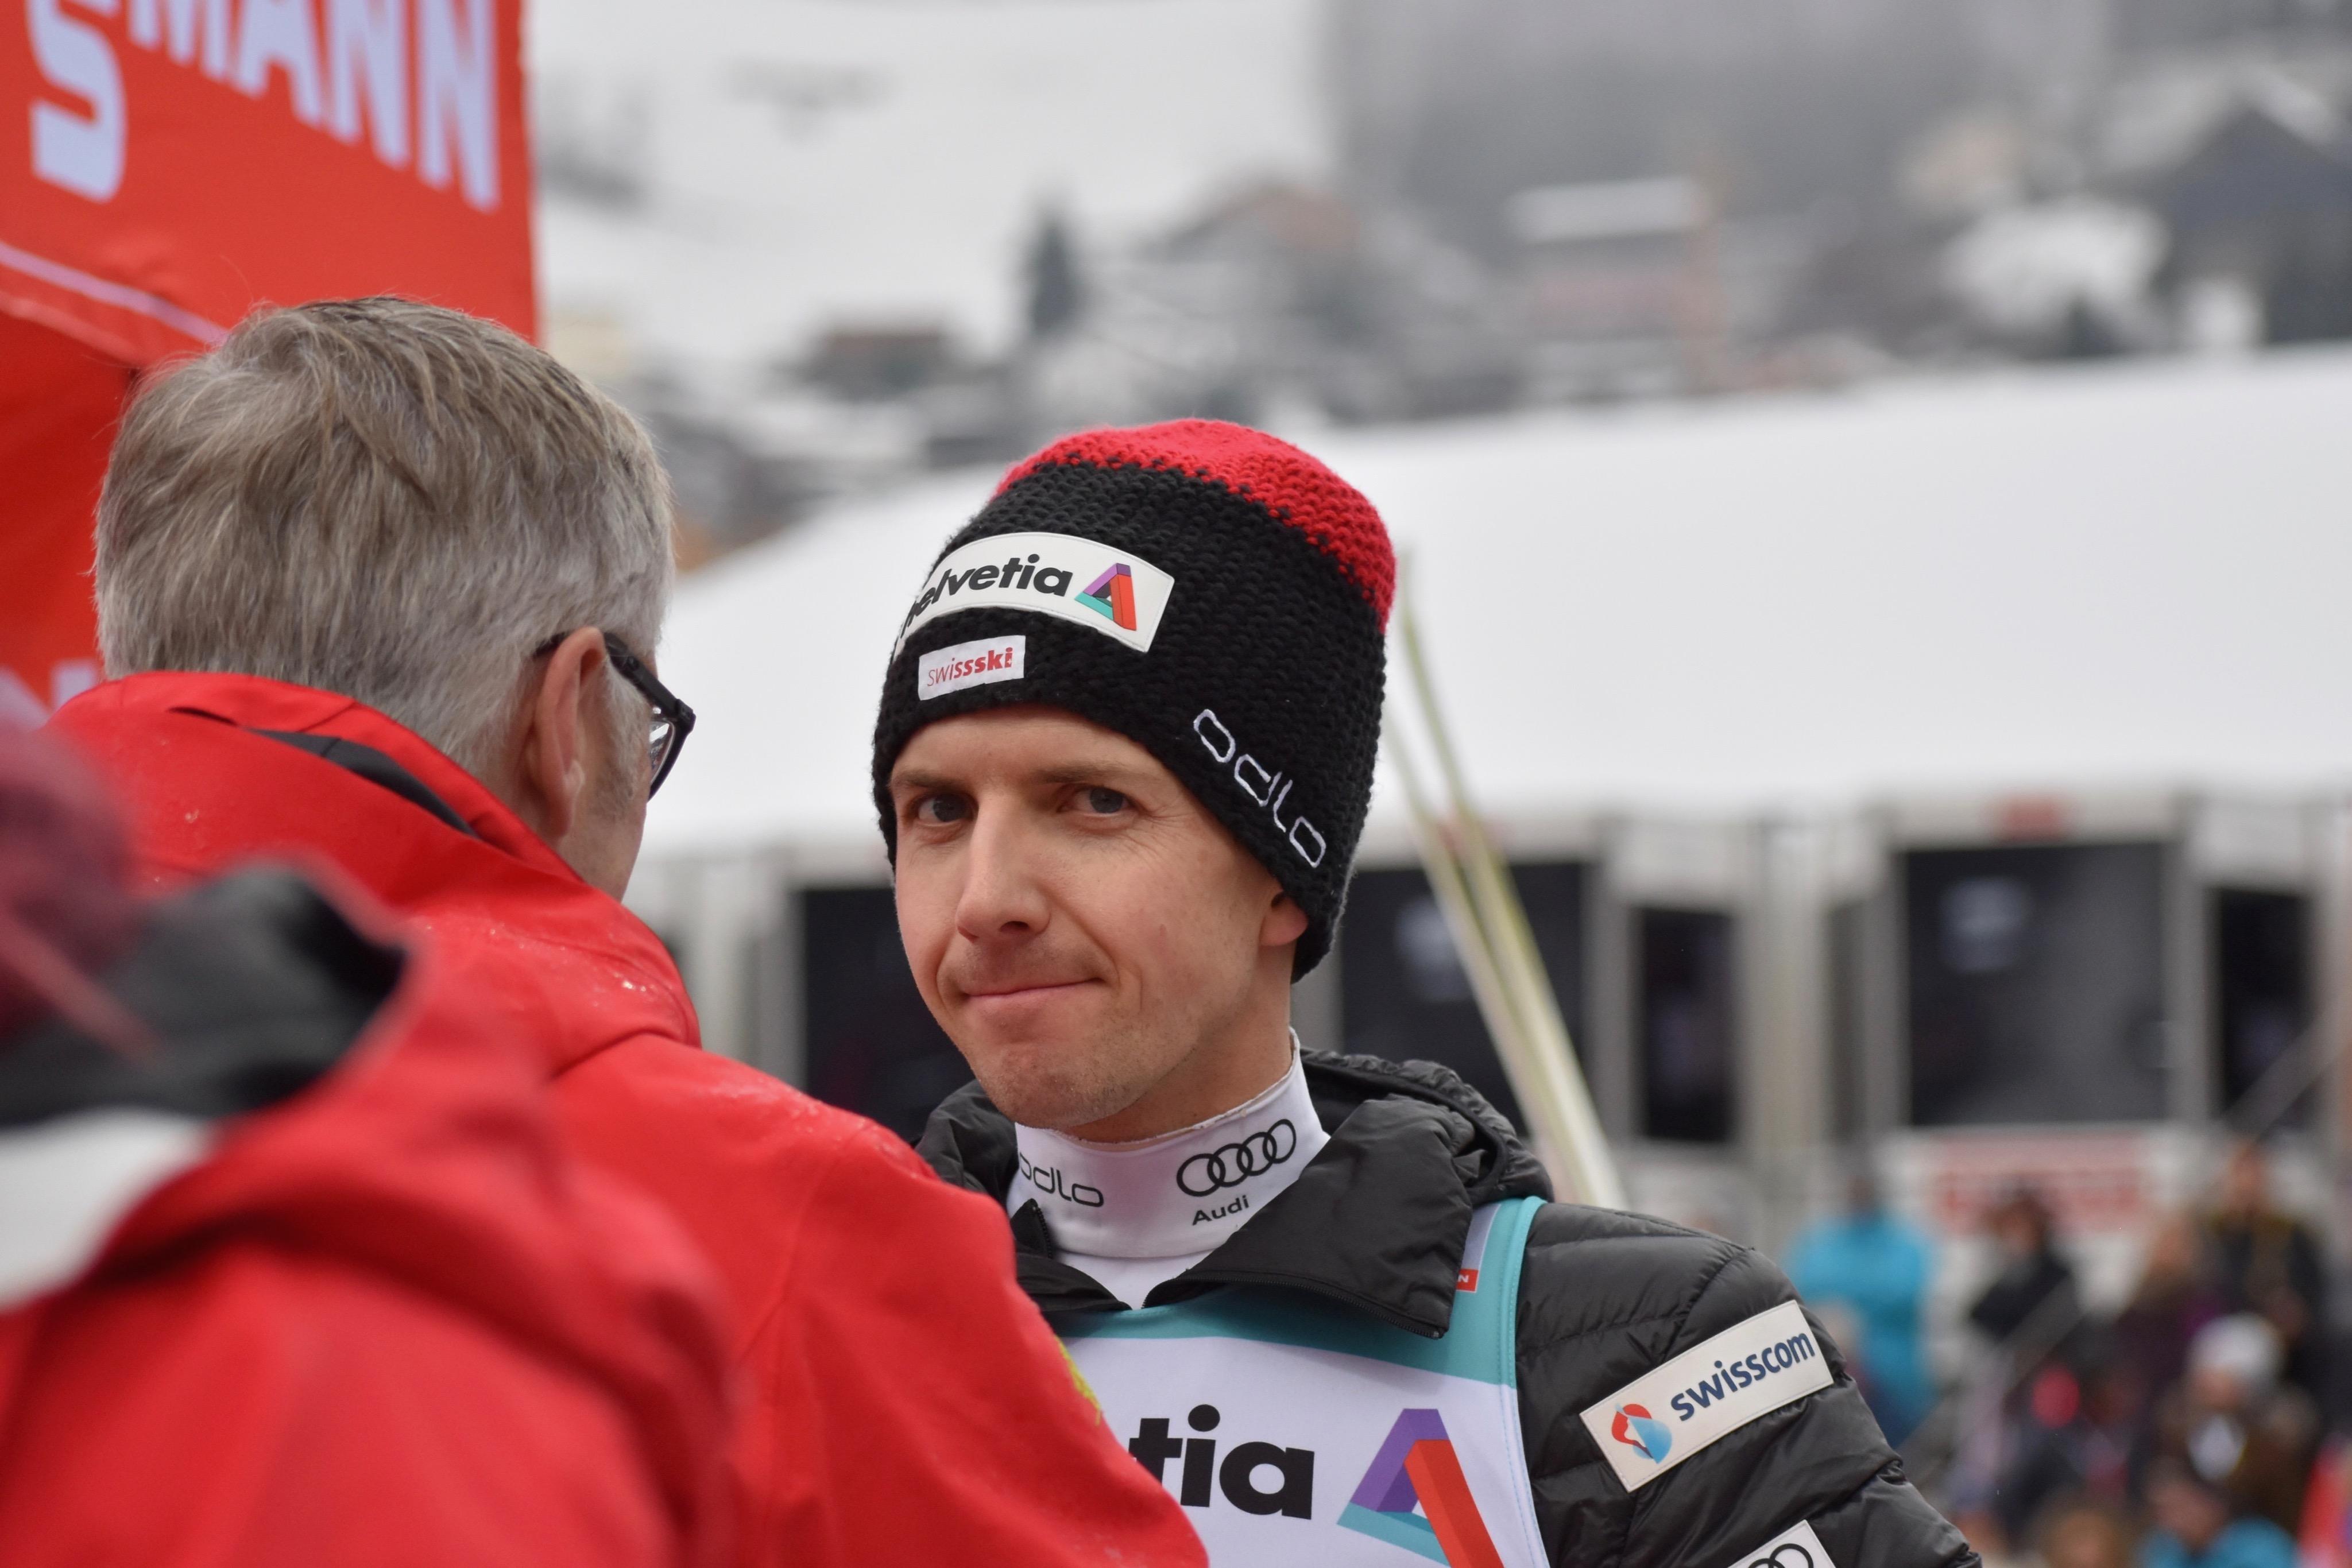 Simon Ammann